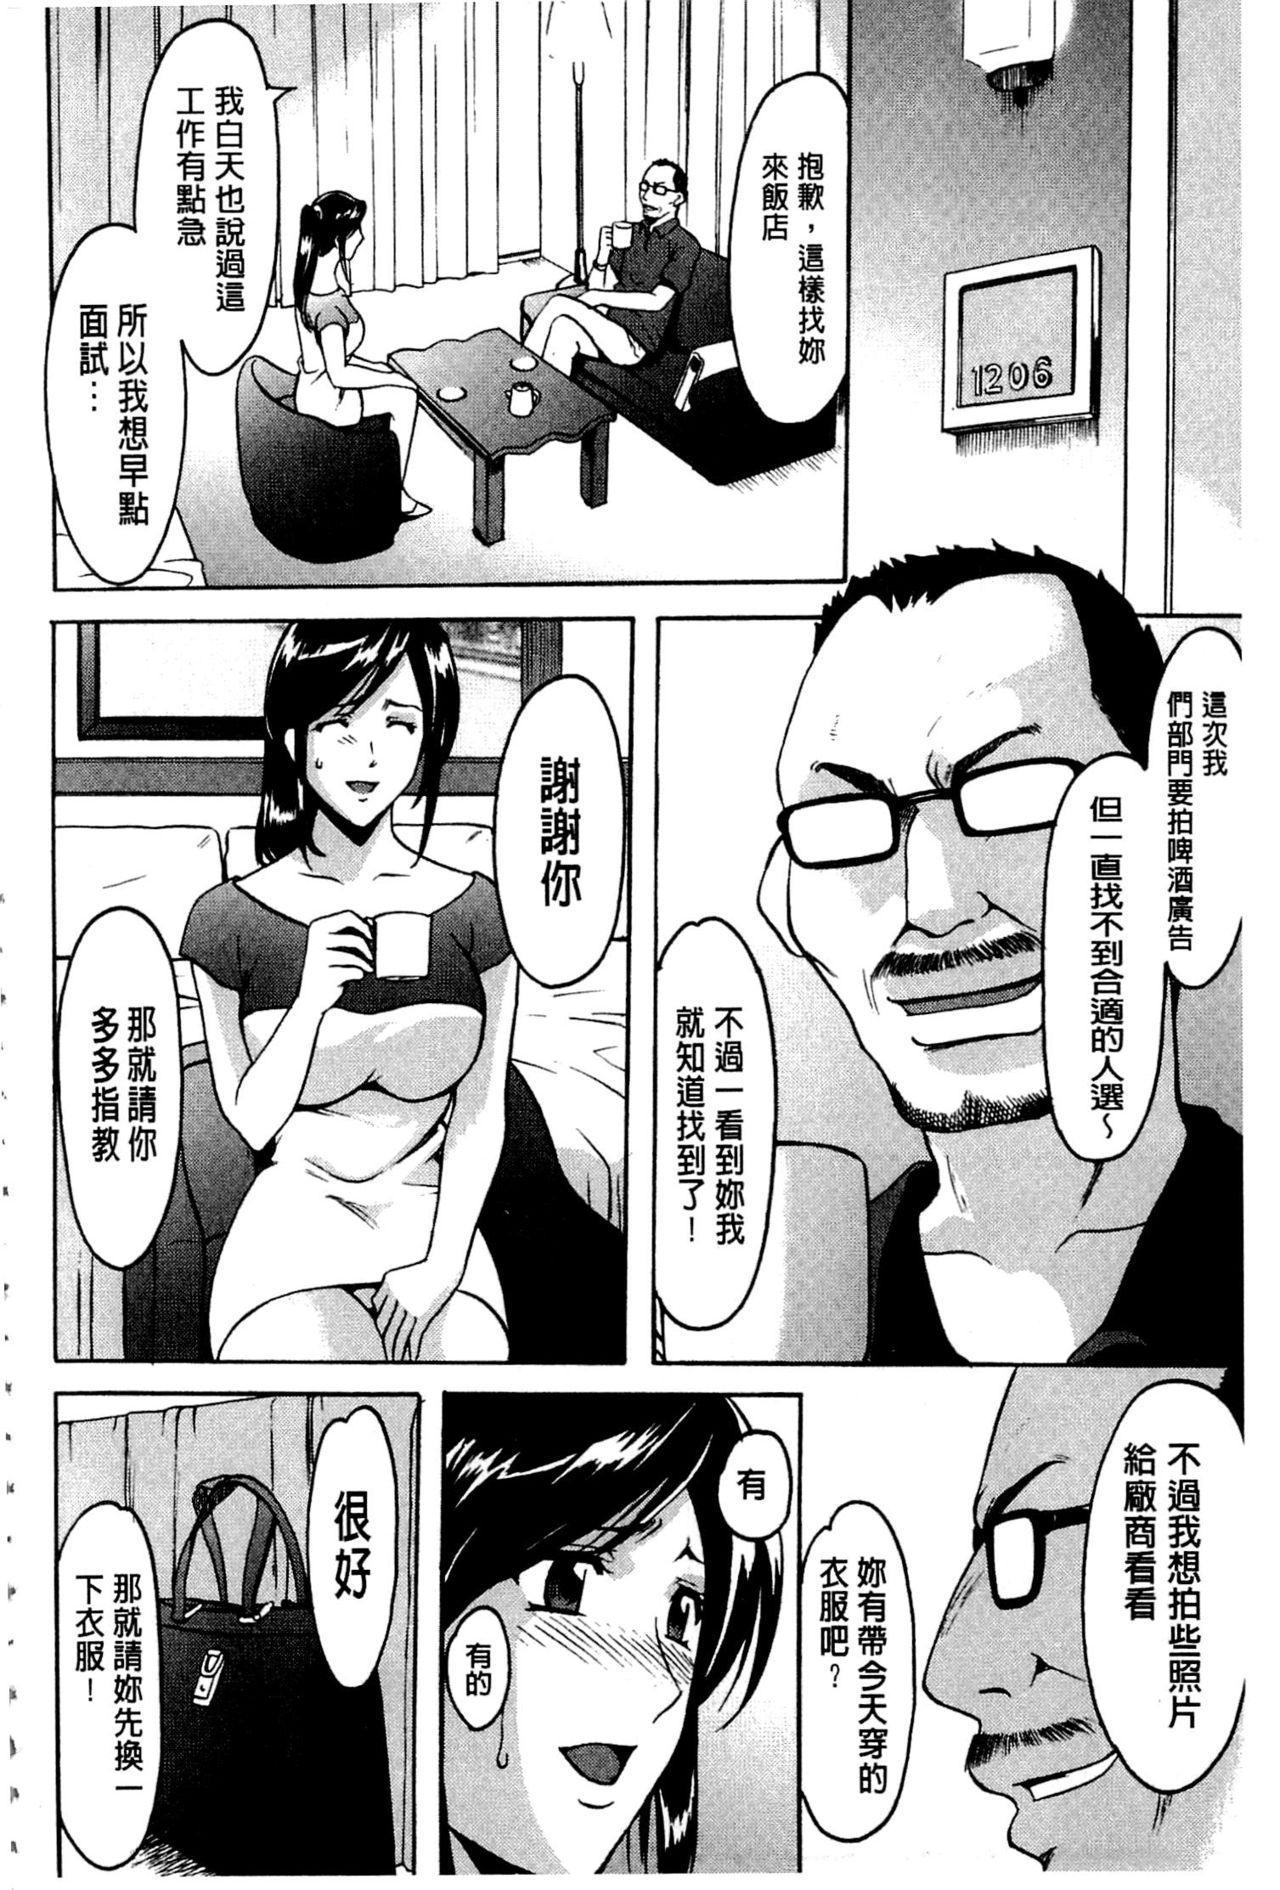 Sennyu Tsuma Satomi Kiroku | 臥底人妻里美 洗腦凌辱的記錄 上集 61